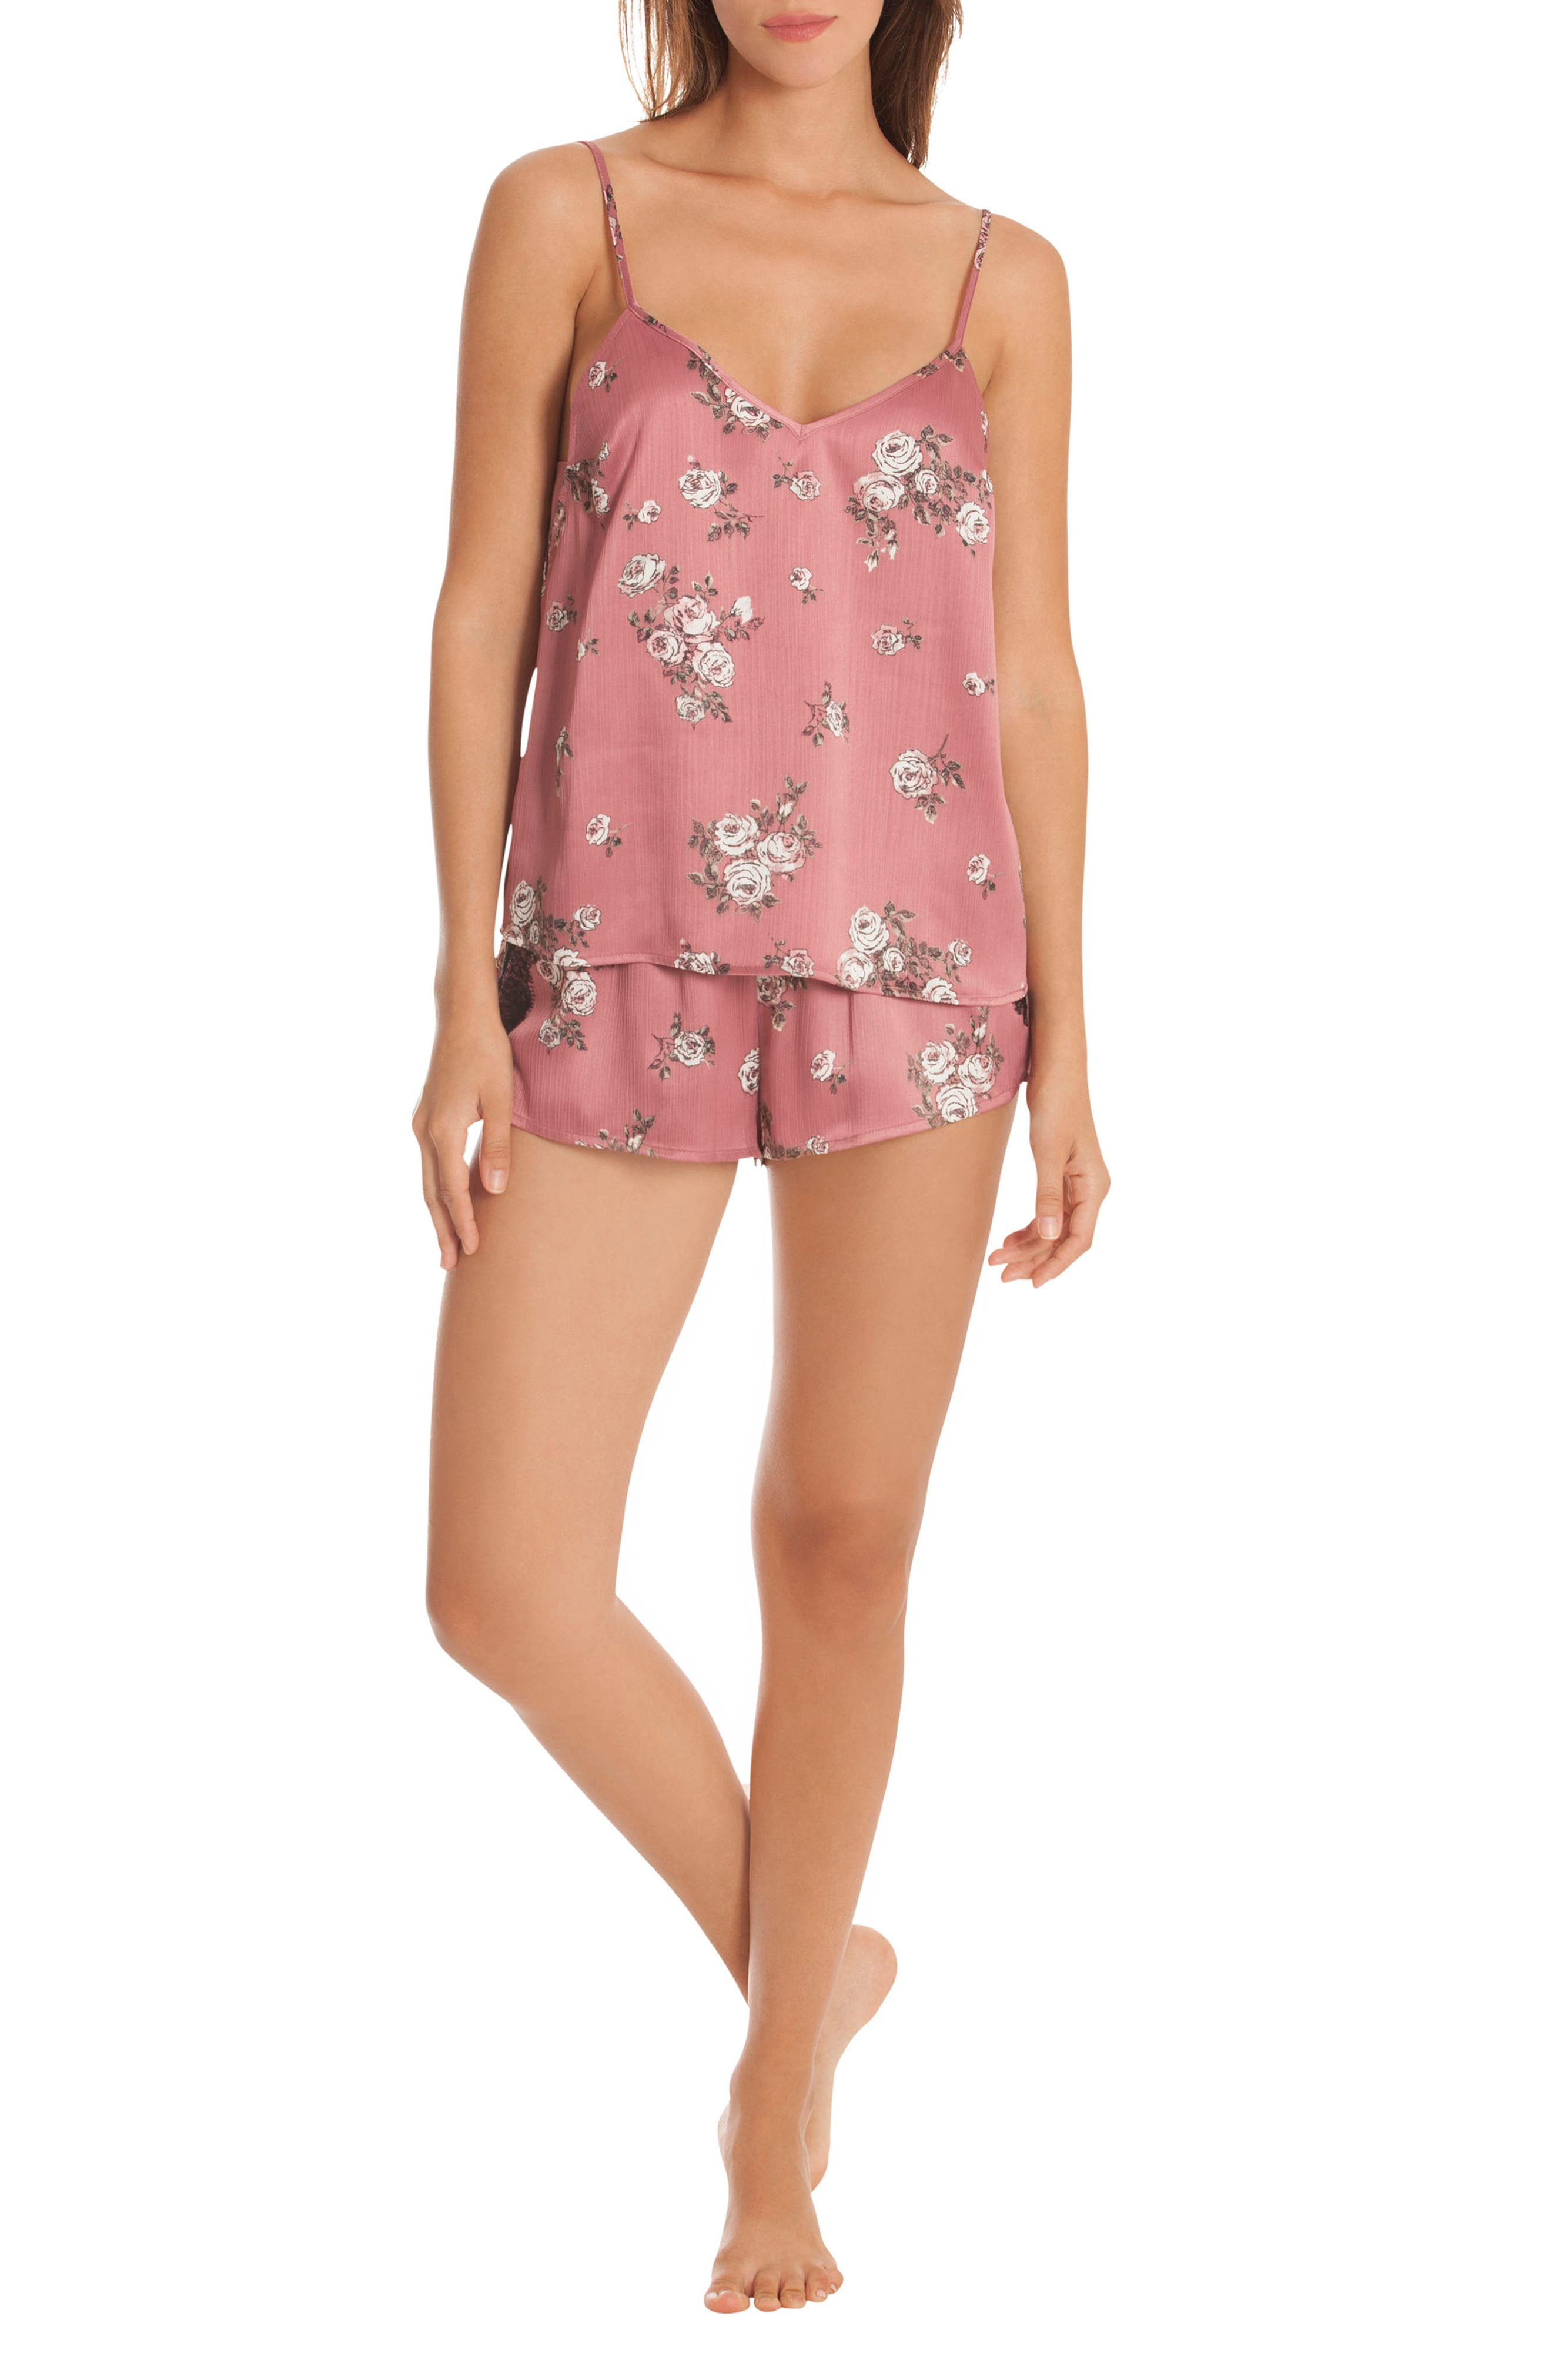 Tegan Short Pajamas,                             Alternate thumbnail 7, color,                             650